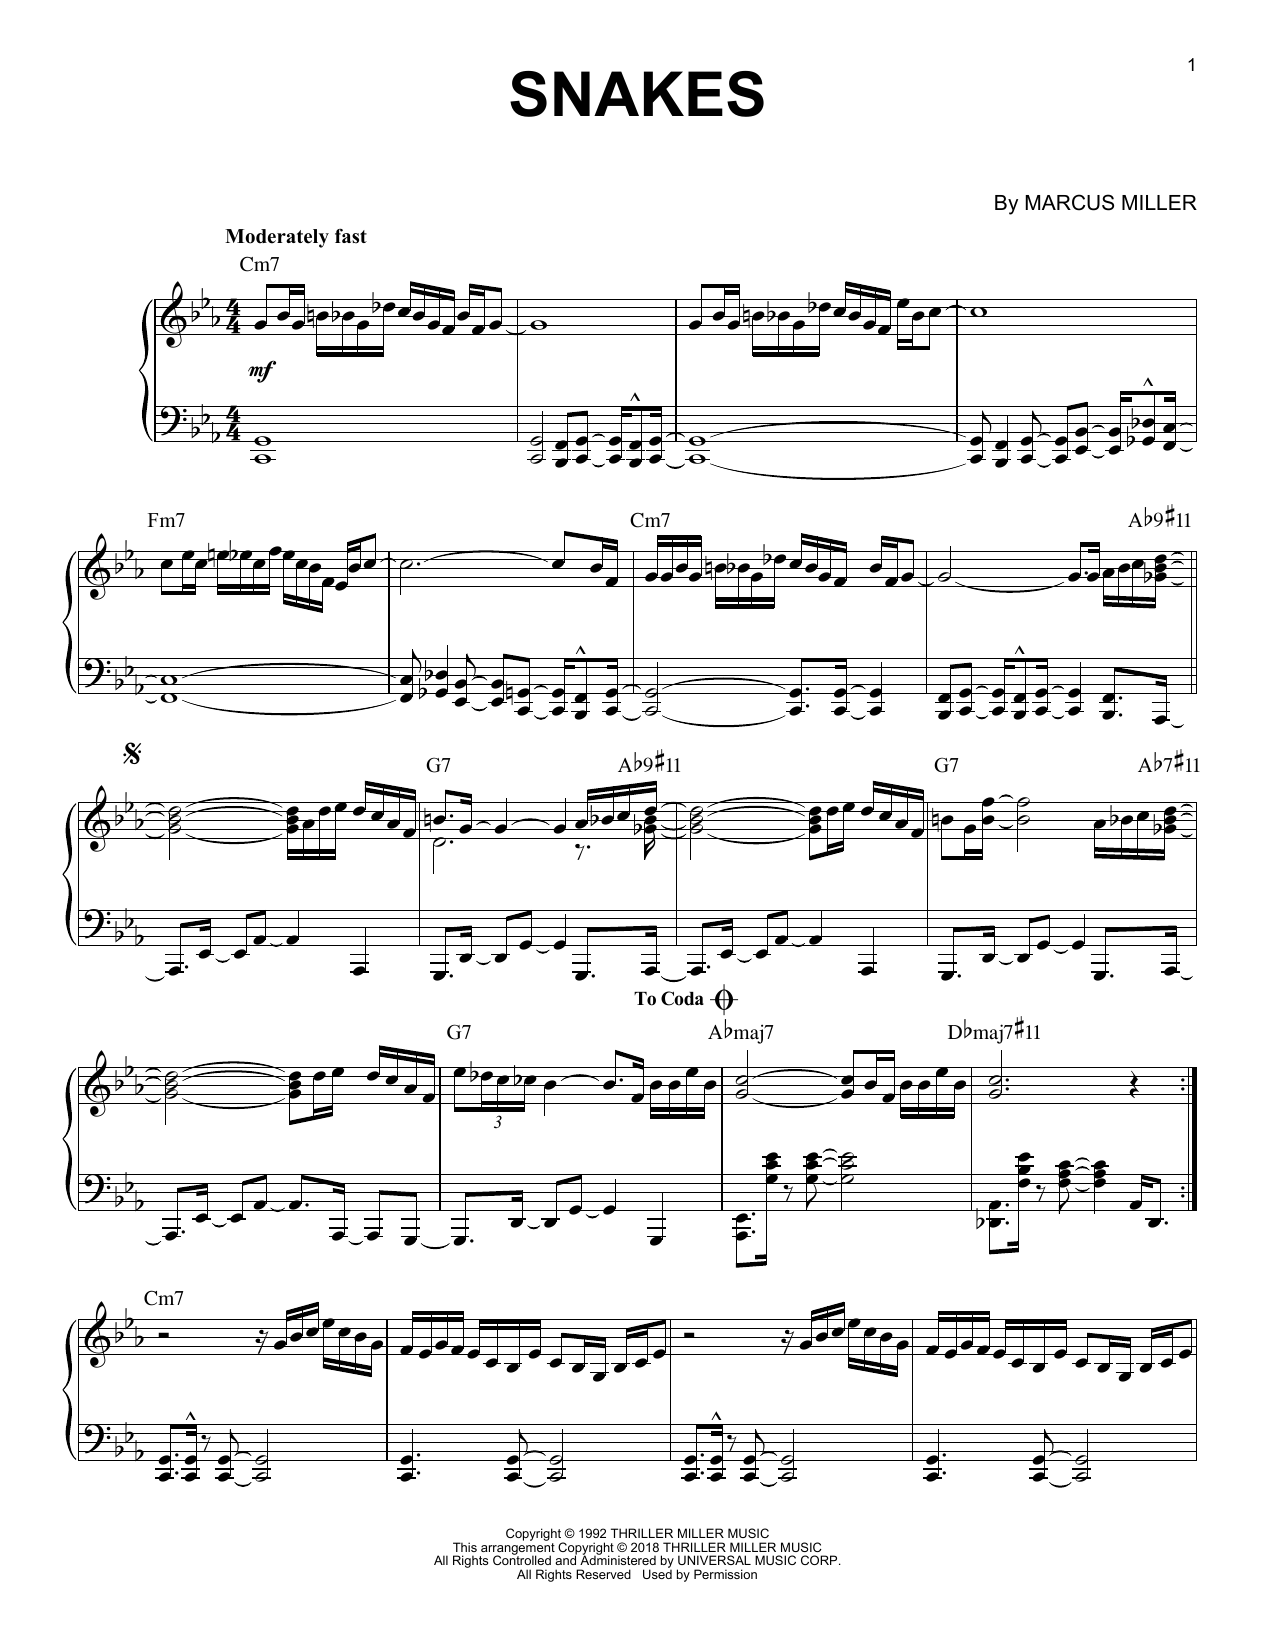 David Sanborn Snakes sheet music notes and chords. Download Printable PDF.